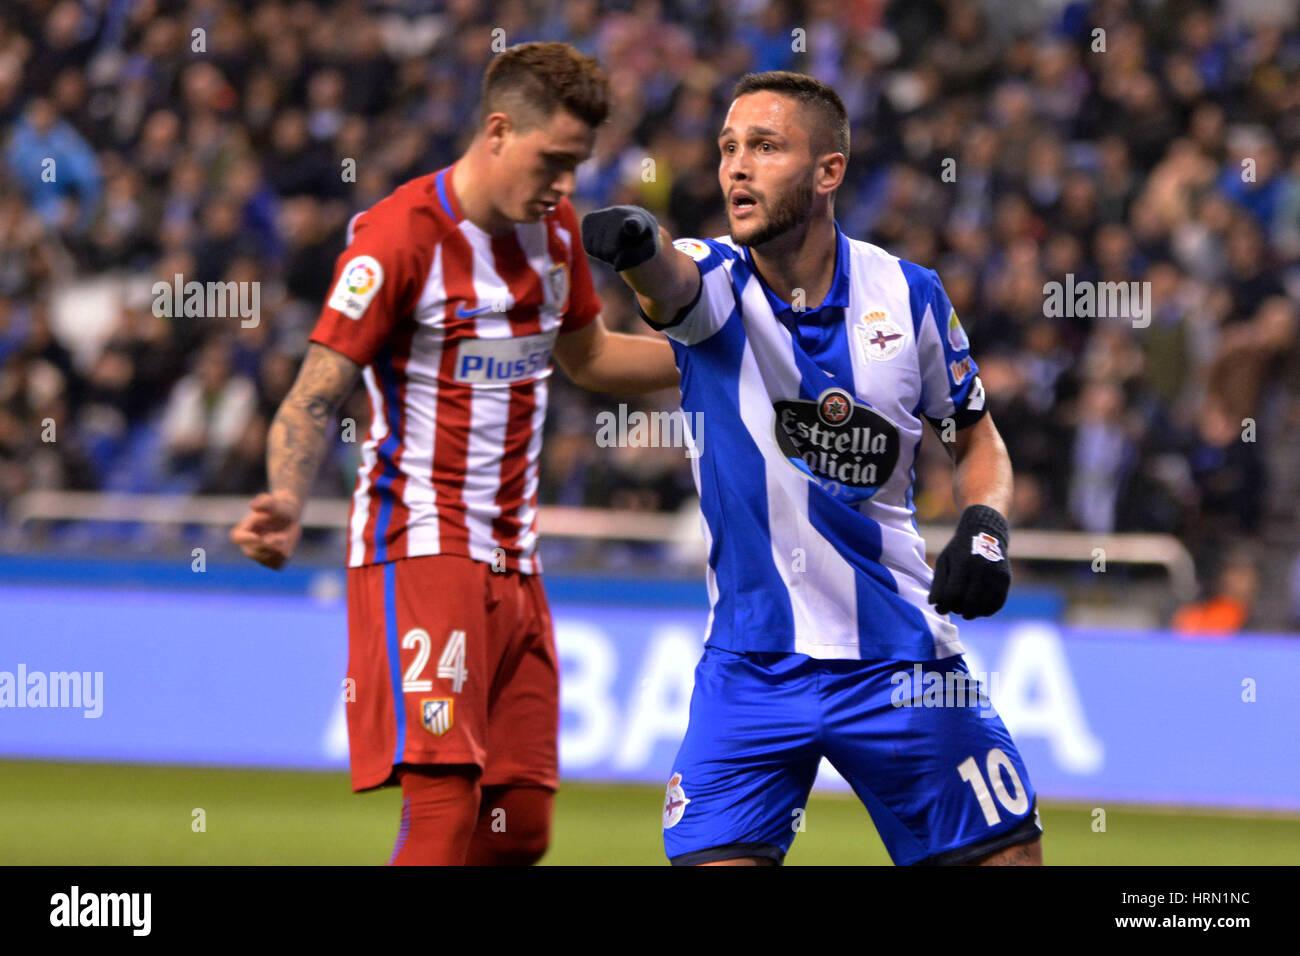 Riazor Stadium, La Coruna, Spain. 2nd March 2017. Andone. La Liga Santander Matchday 25. Riazor Stadium, La Coruna, - Stock Image